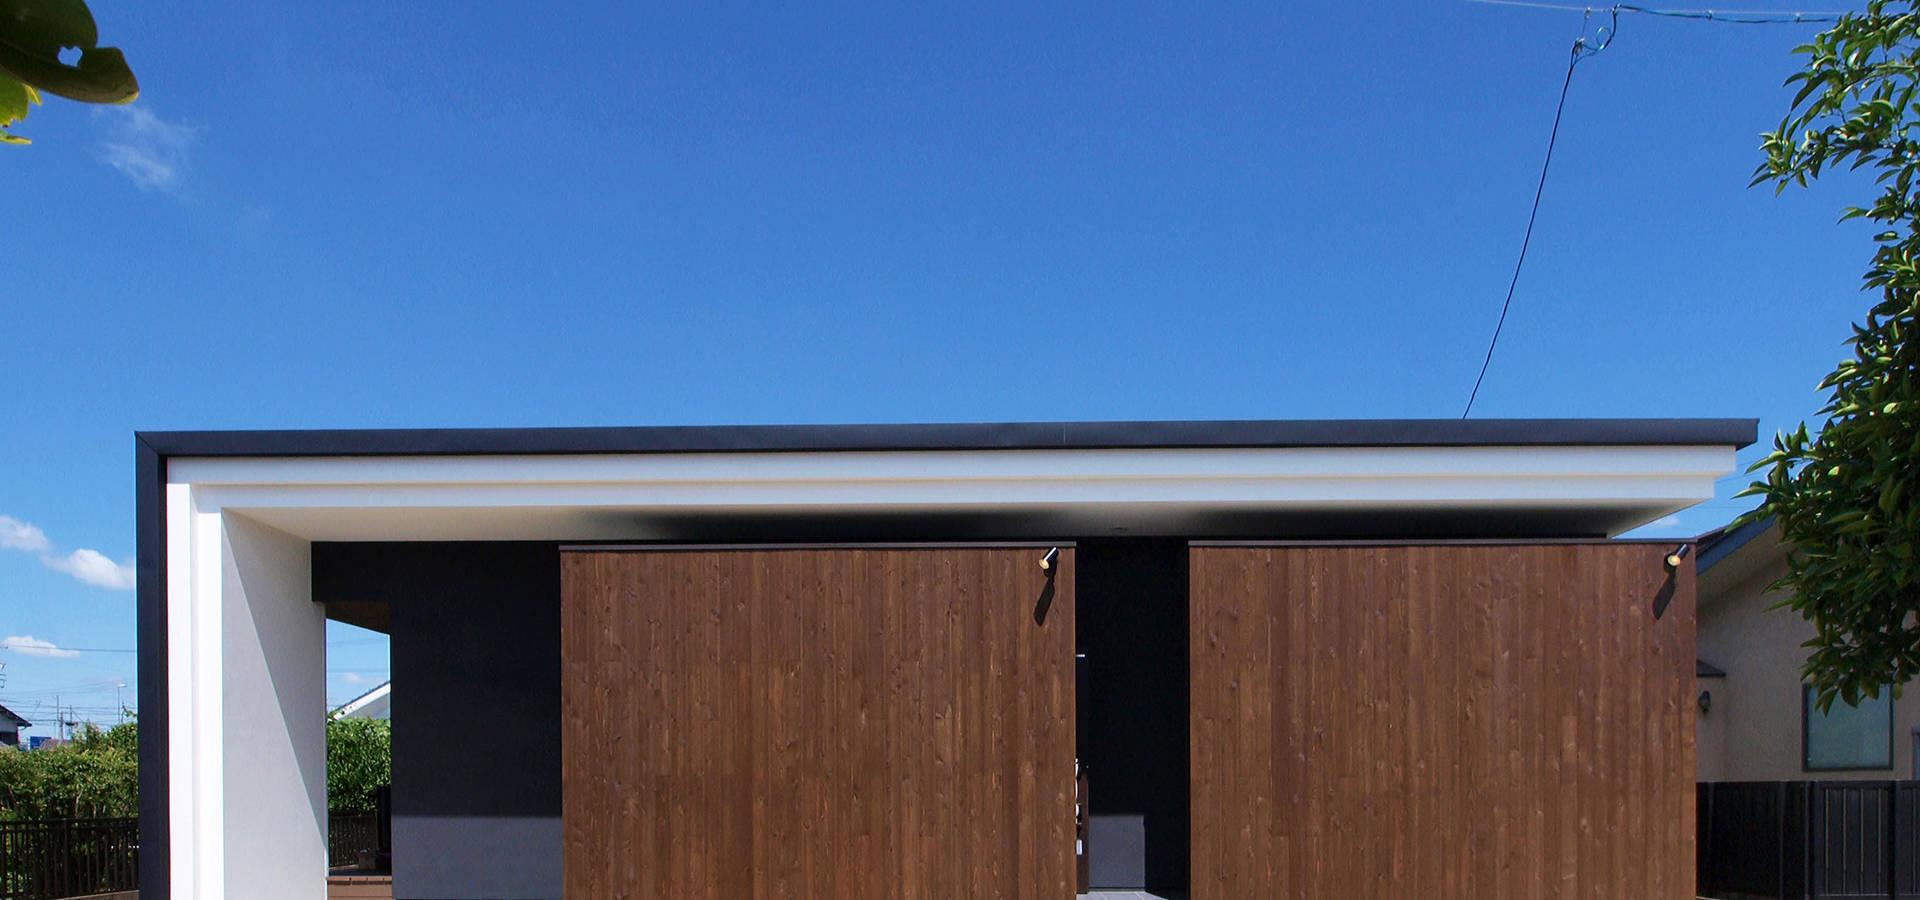 Egawa Architectural Studio